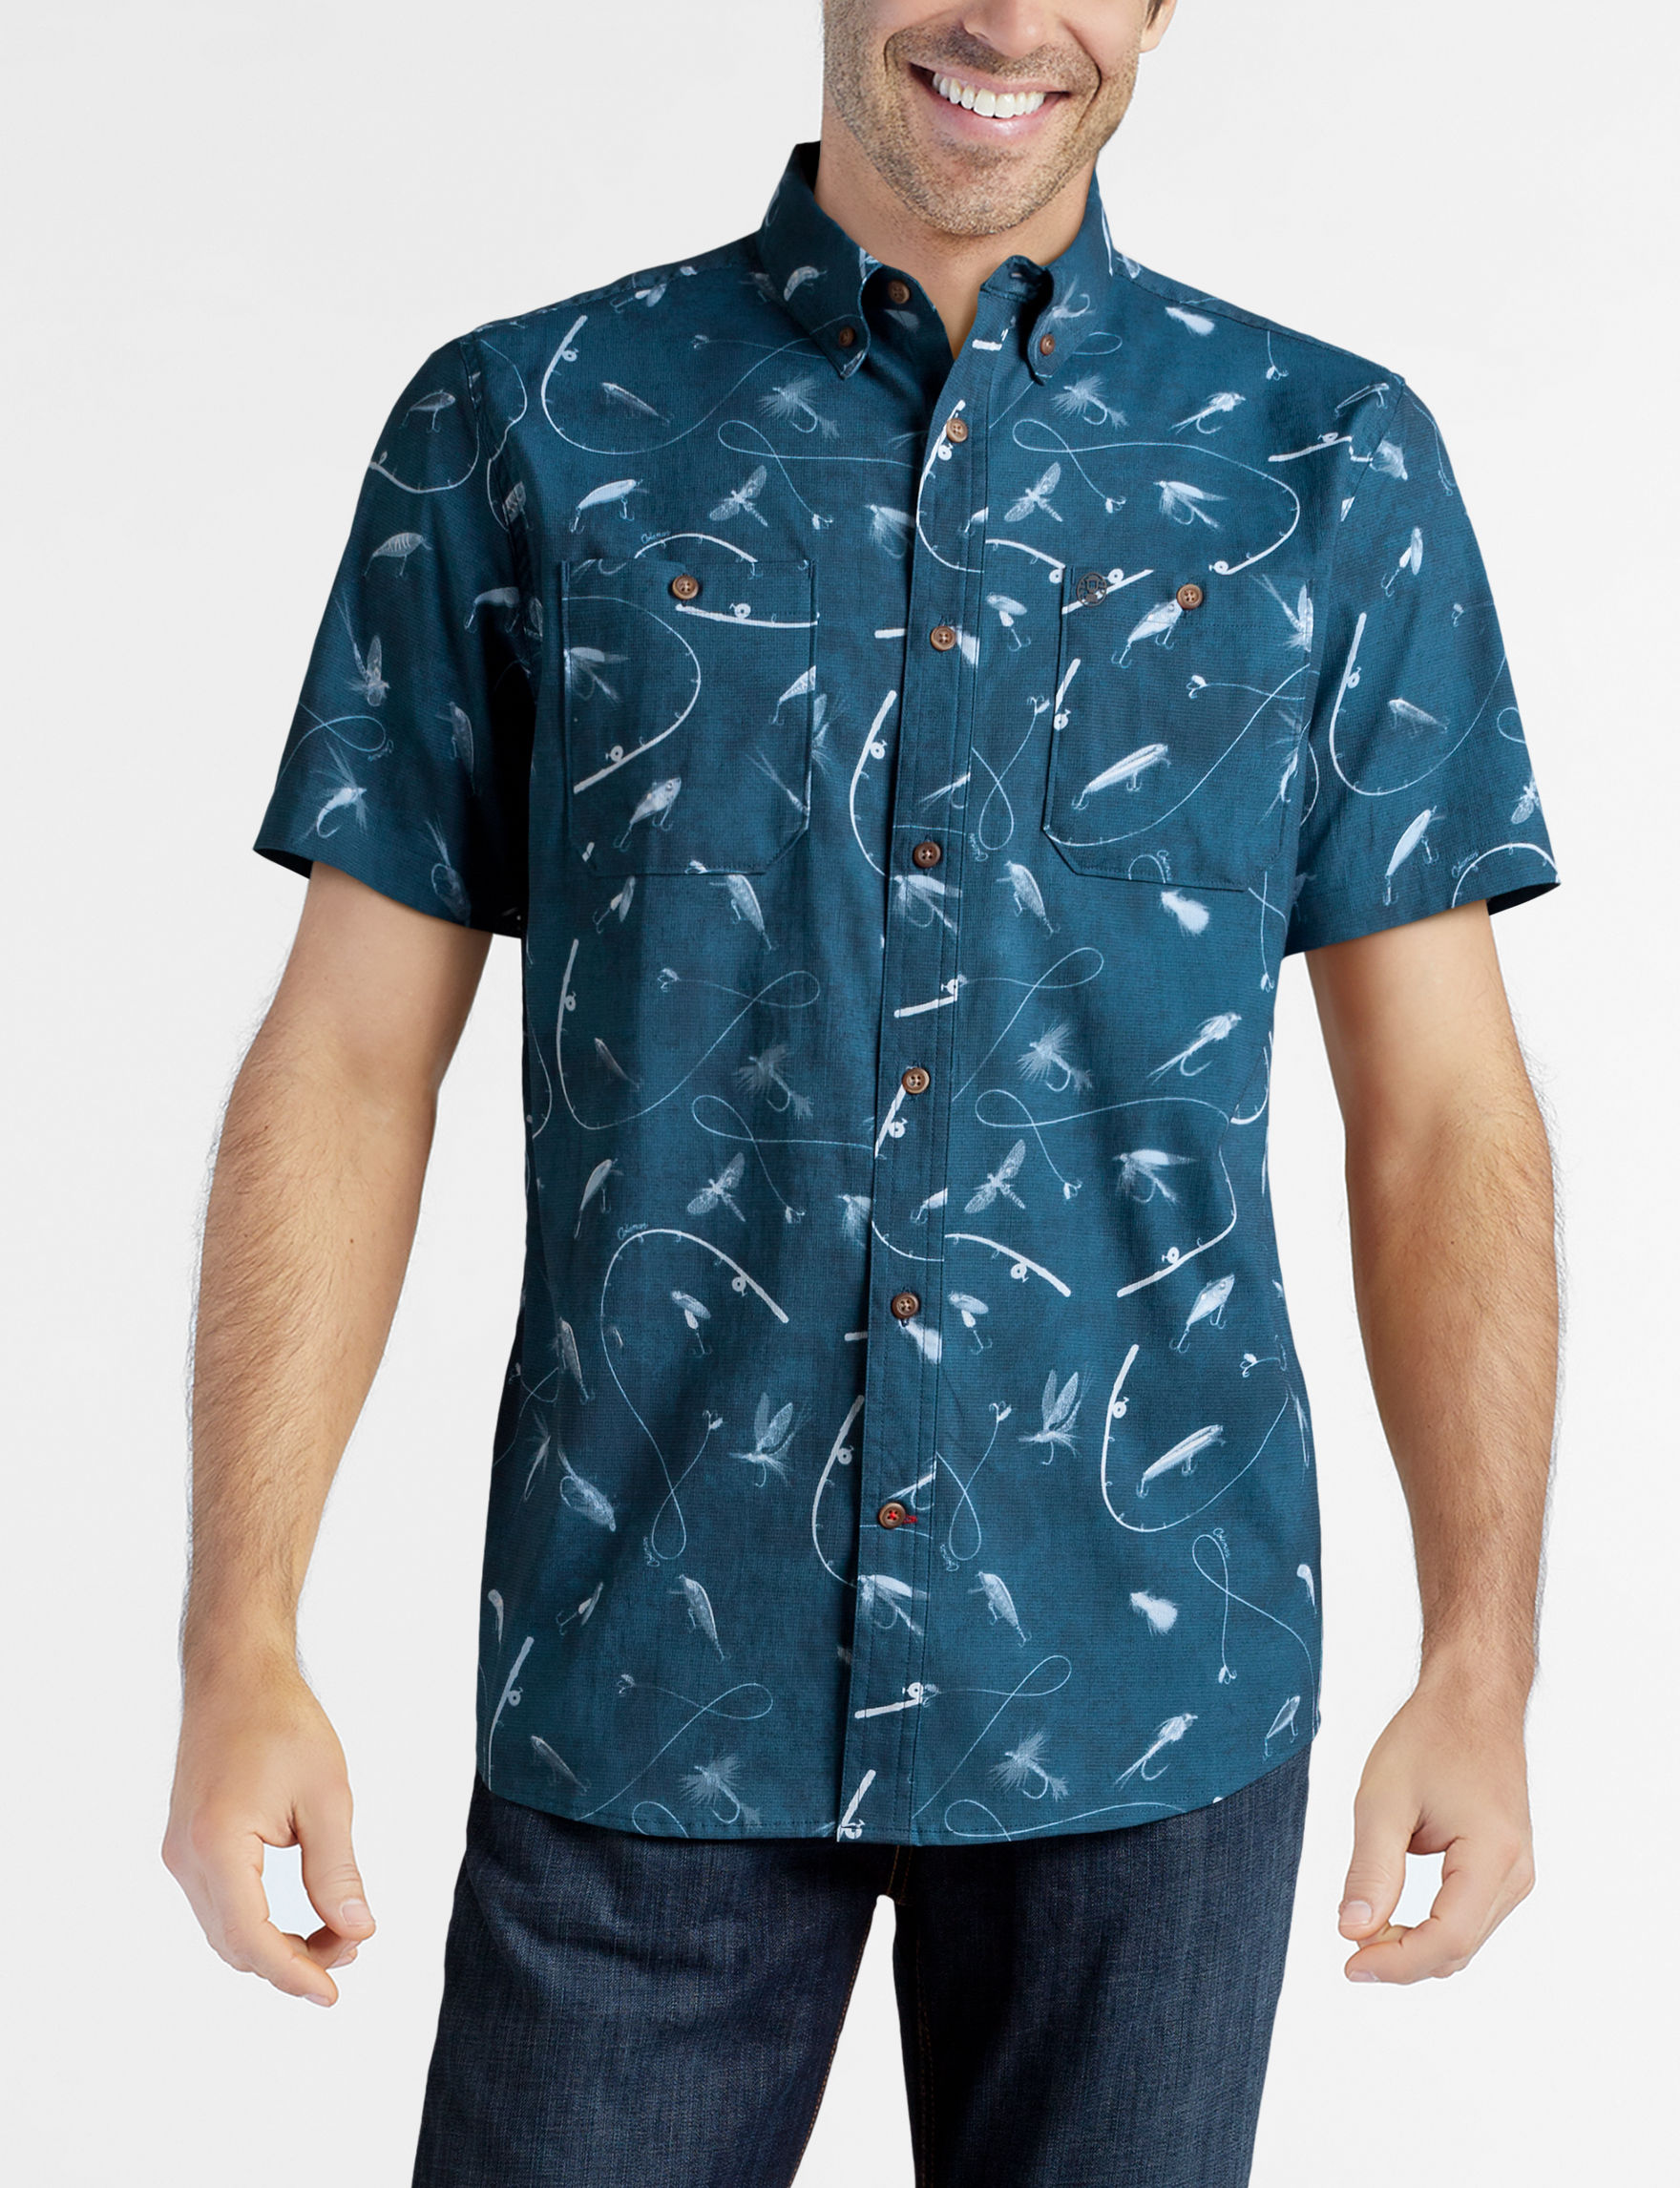 Coleman Dark Blue Casual Button Down Shirts